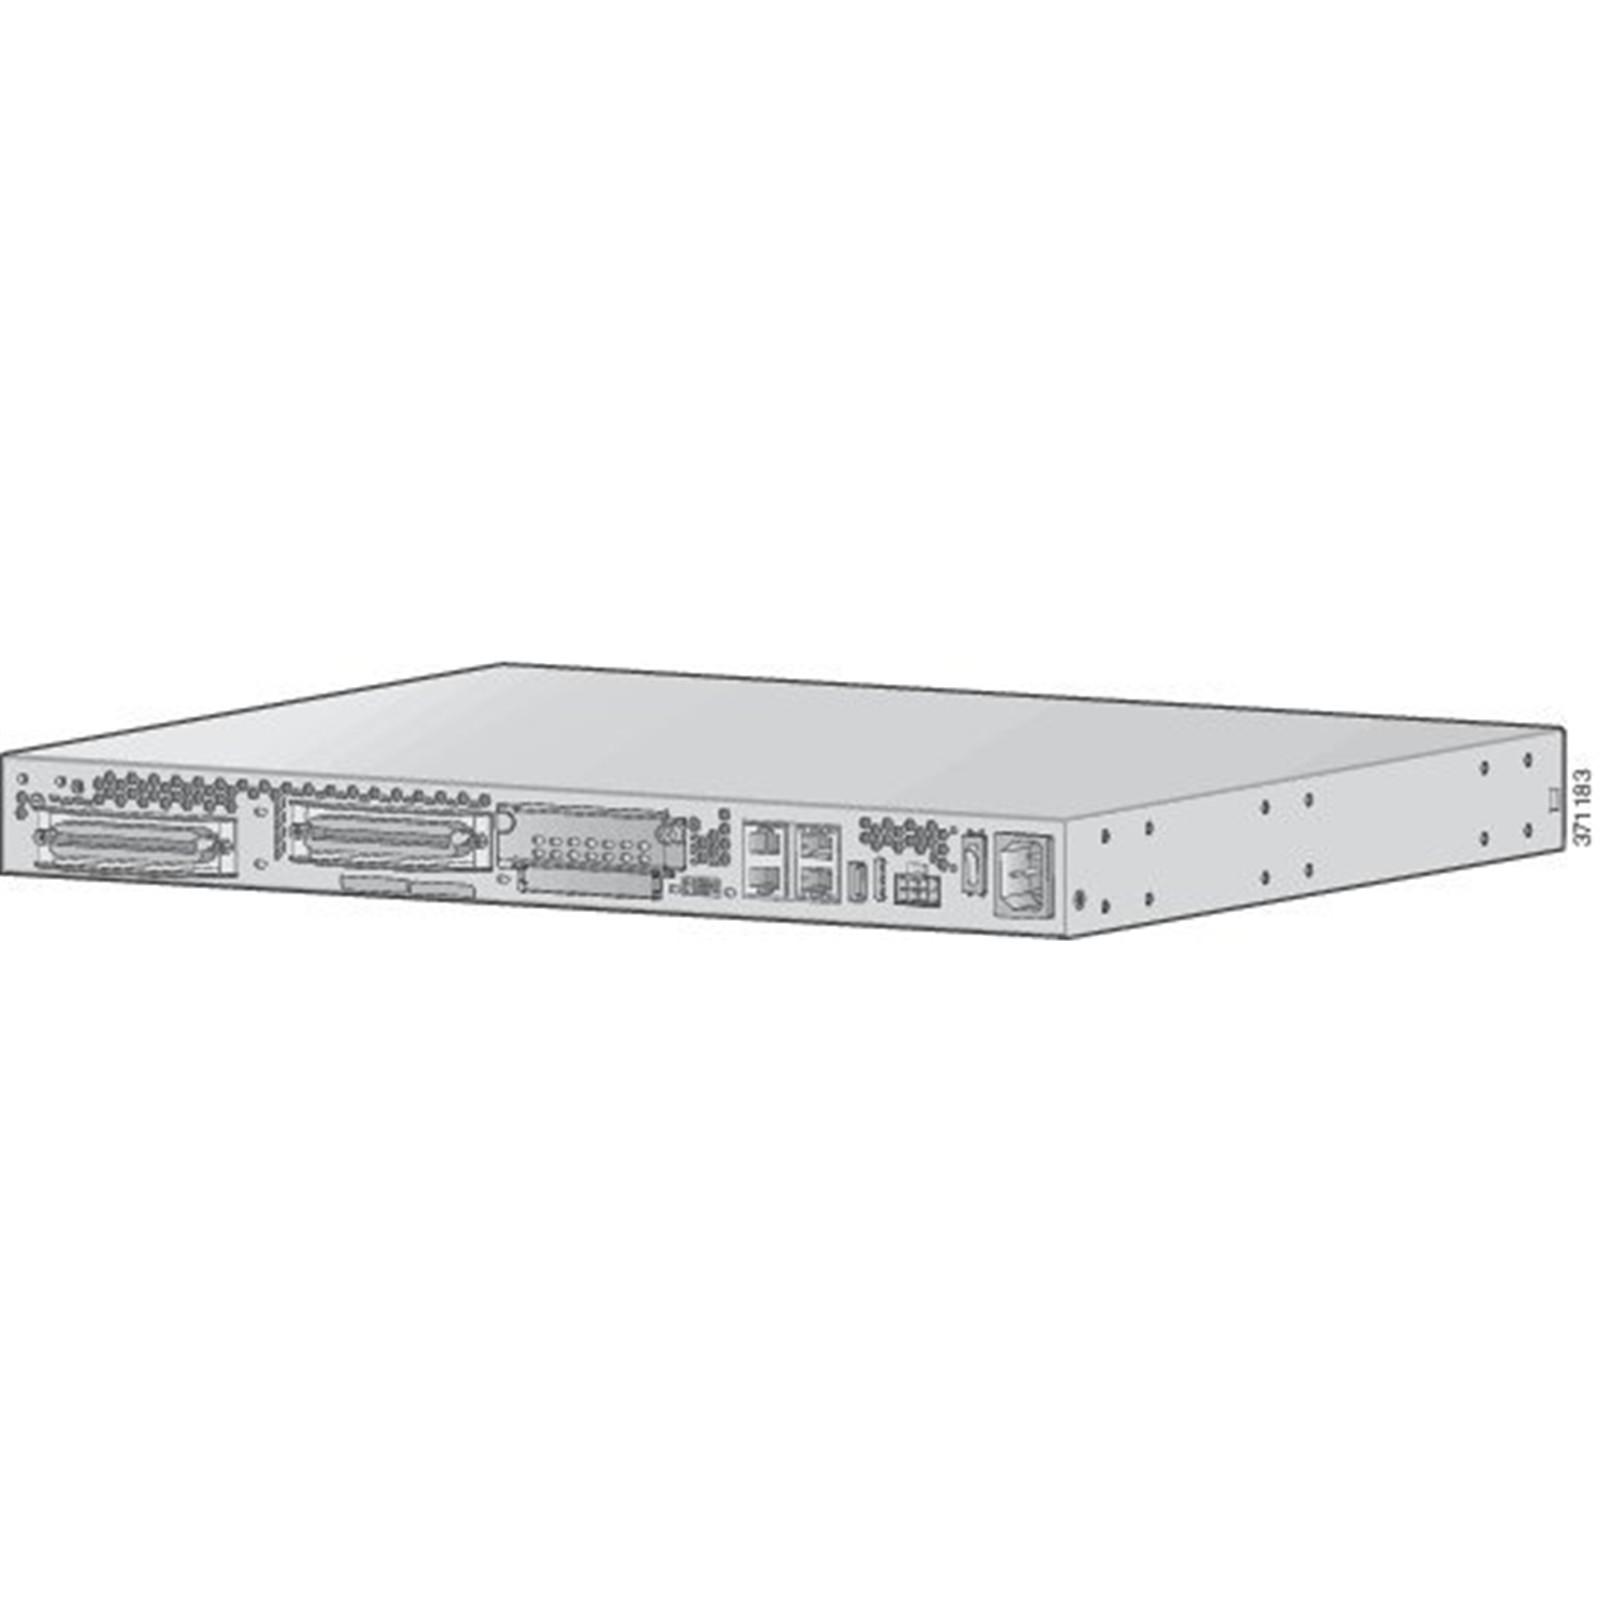 Buy the Cisco VG320 VG320 - Mod 48 FXS Port Voice over IP GW